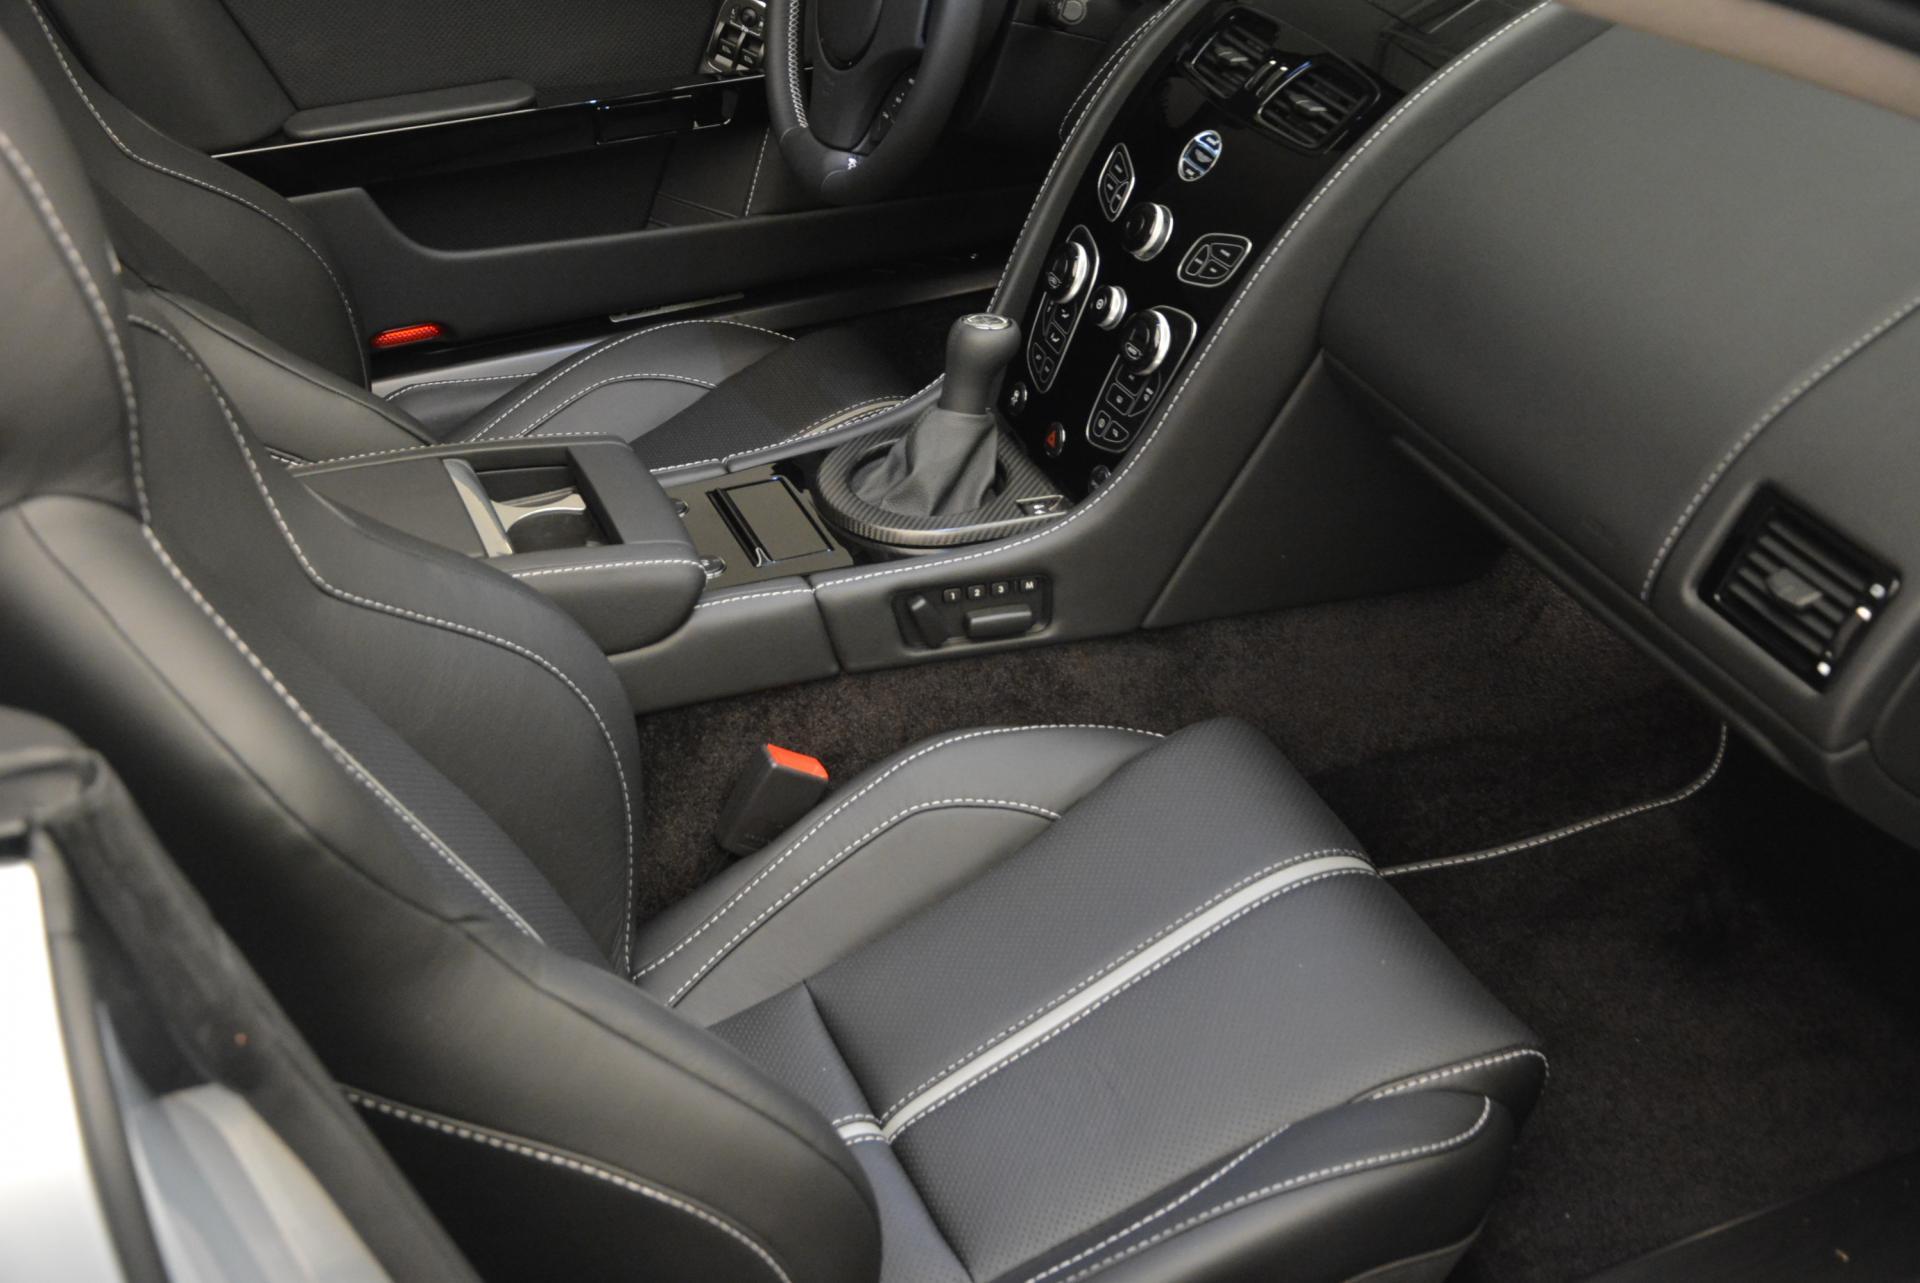 New-2016-Aston-Martin-V8-Vantage-GTS-Roadster